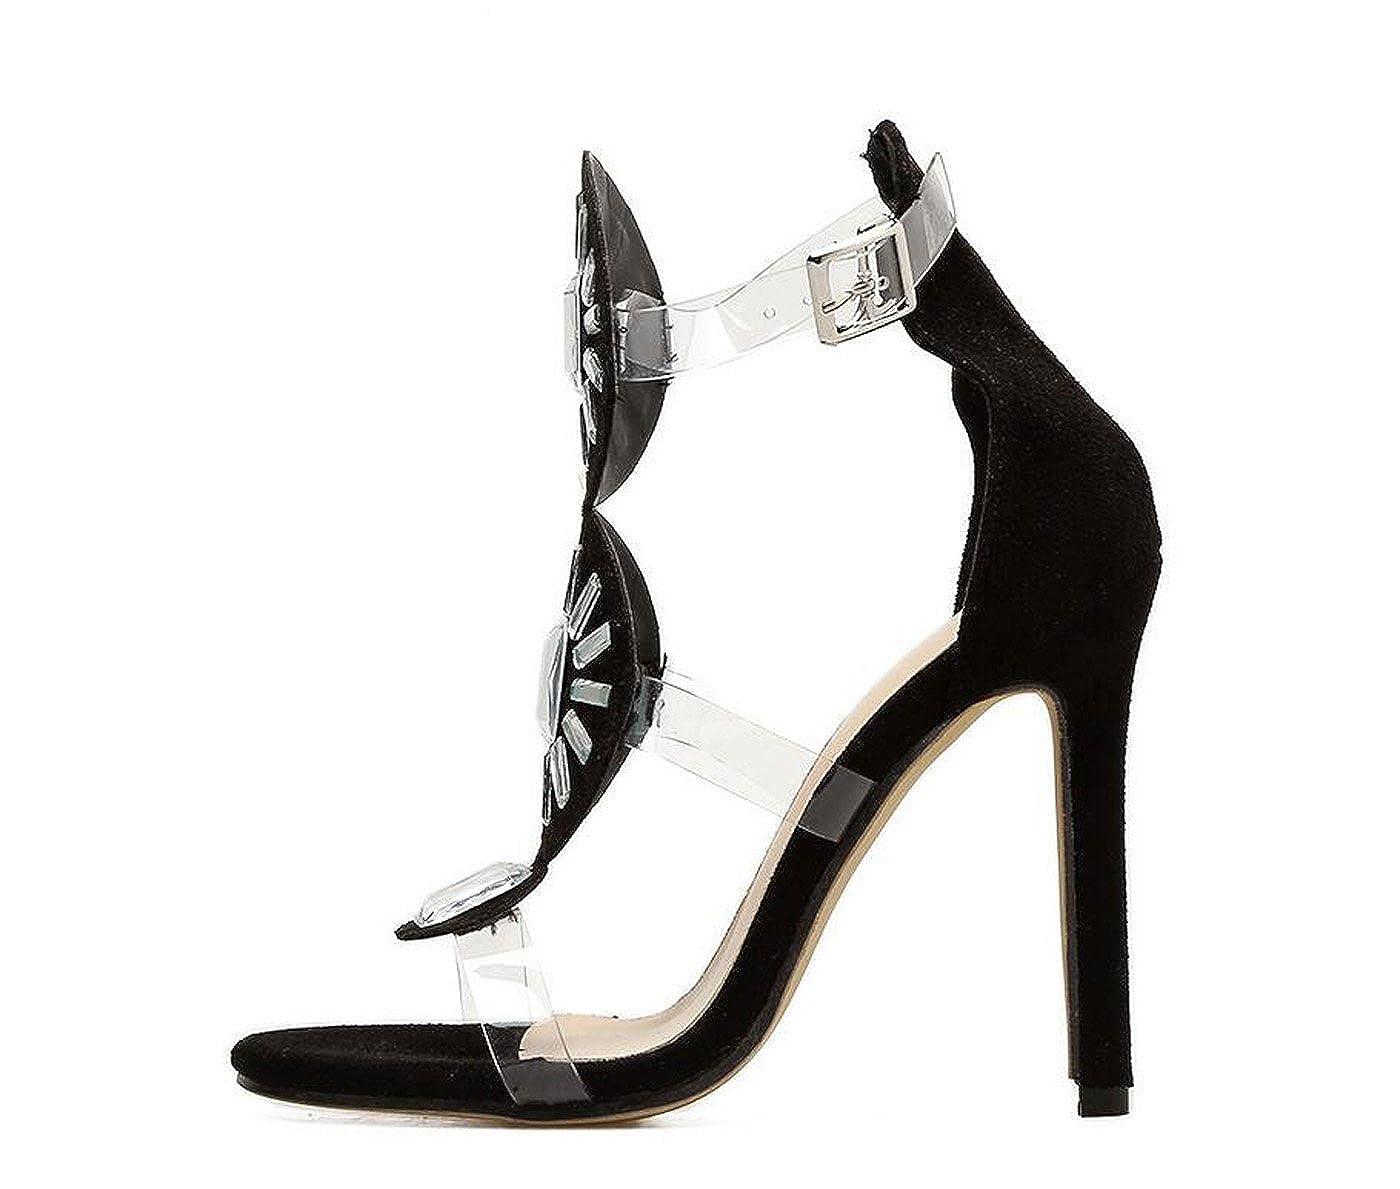 3764dfa0d0 Amazon.com | Women's High Heel Sandals Roman Exotic High Heels Summer  Luxury Club Shoes Outdoor Sandals | Heeled Sandals